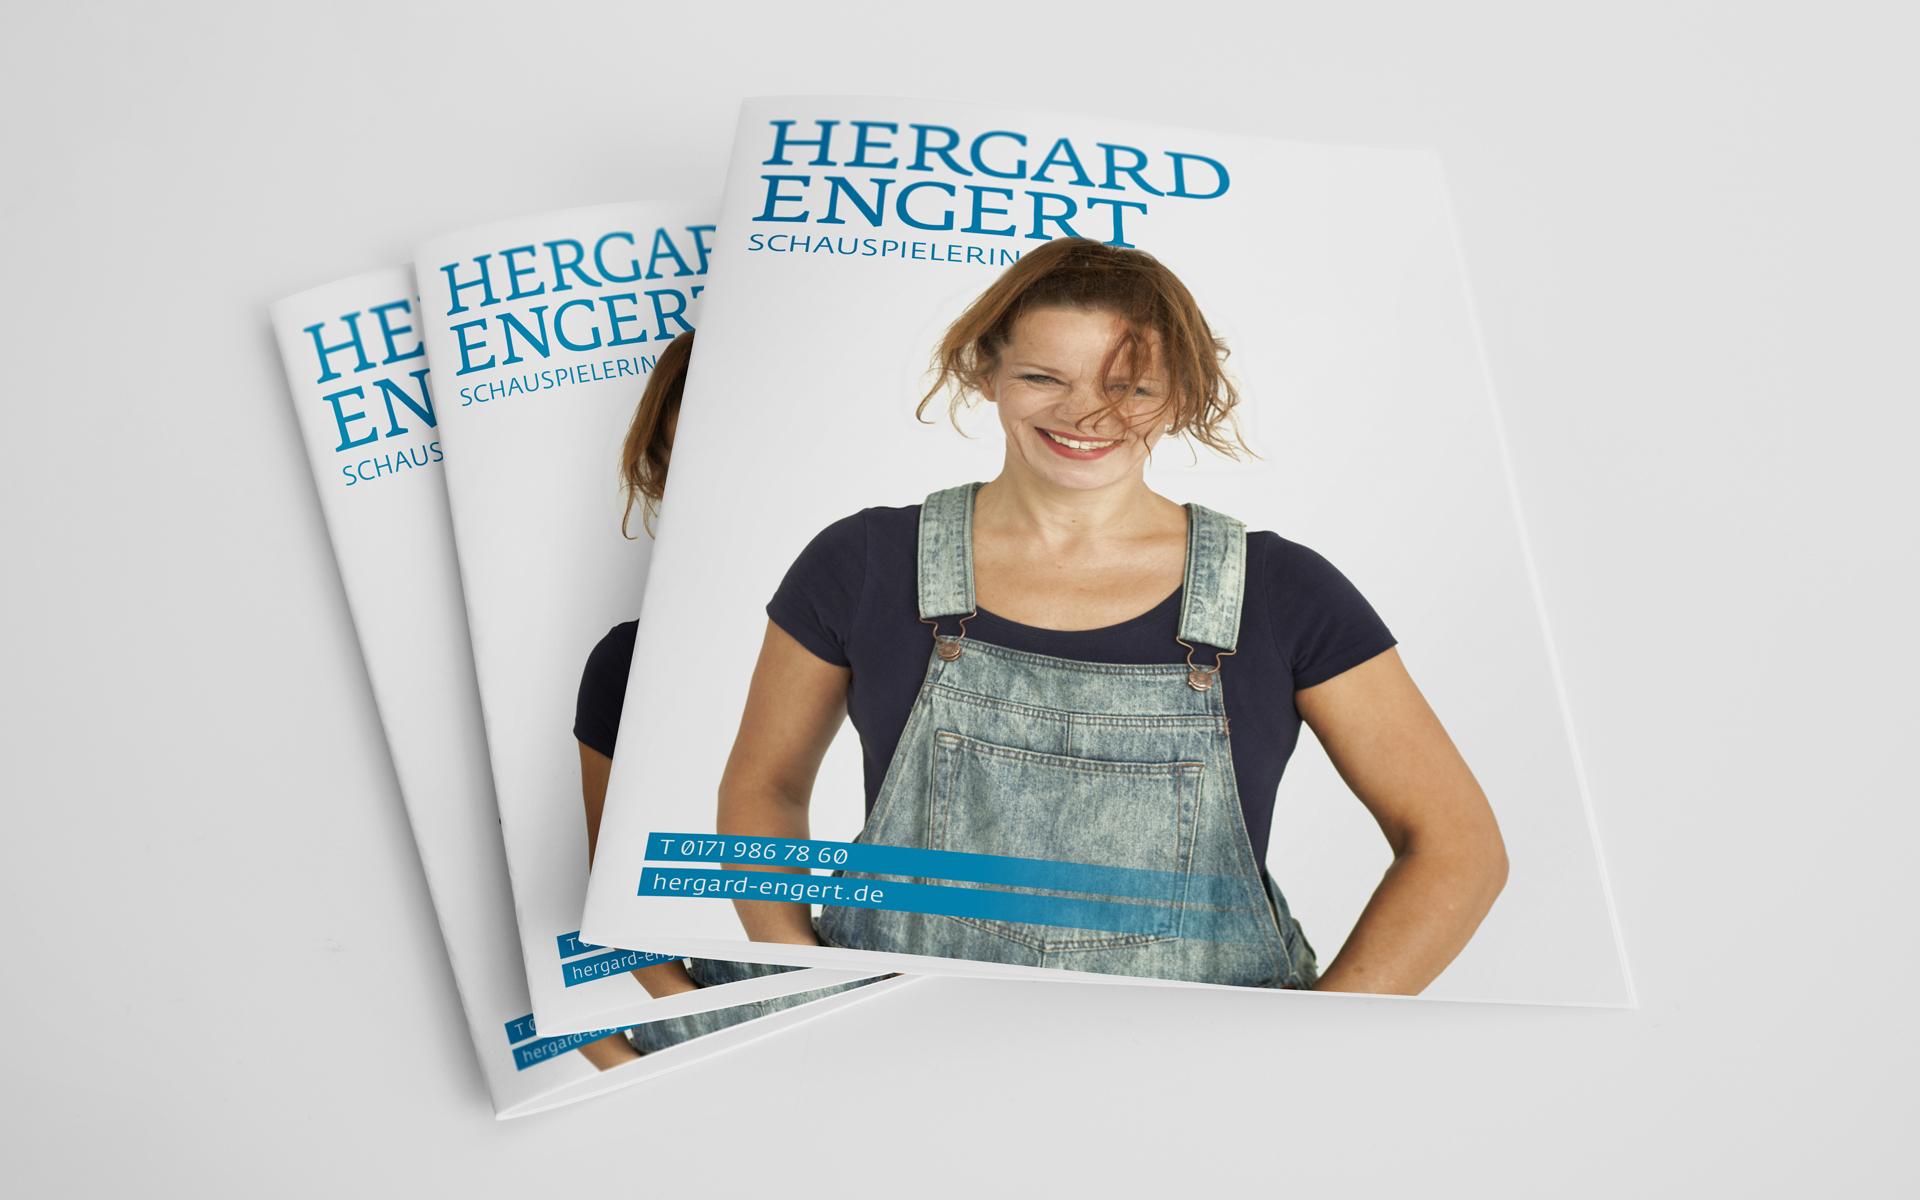 Folder Hergard Engert